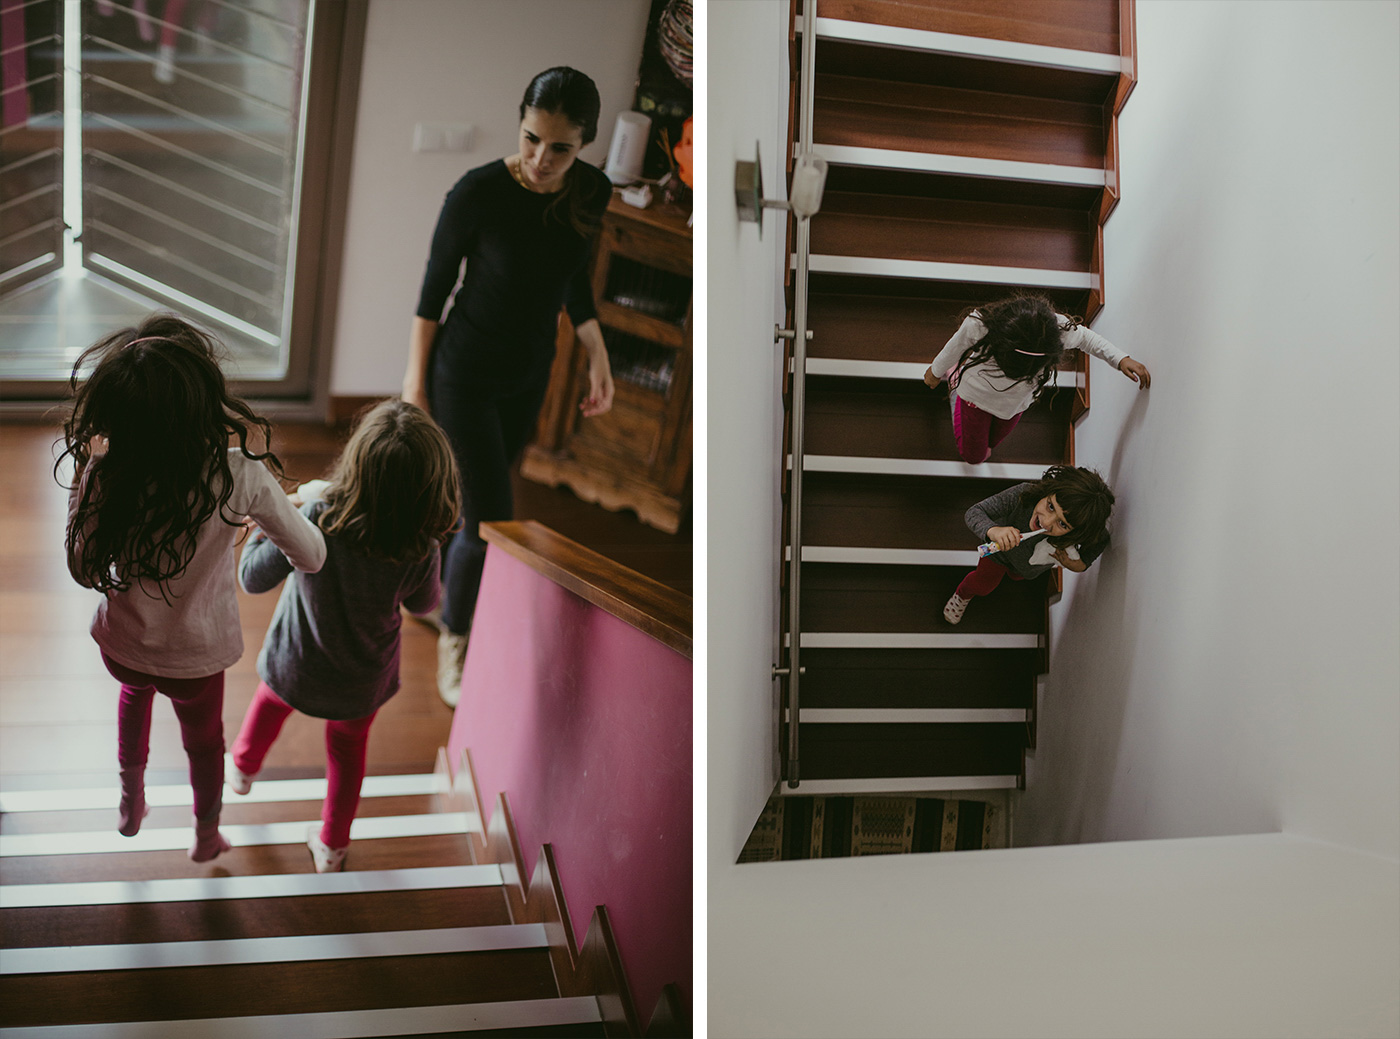 Velvet-Hush-fotografos-sesion-familia-009